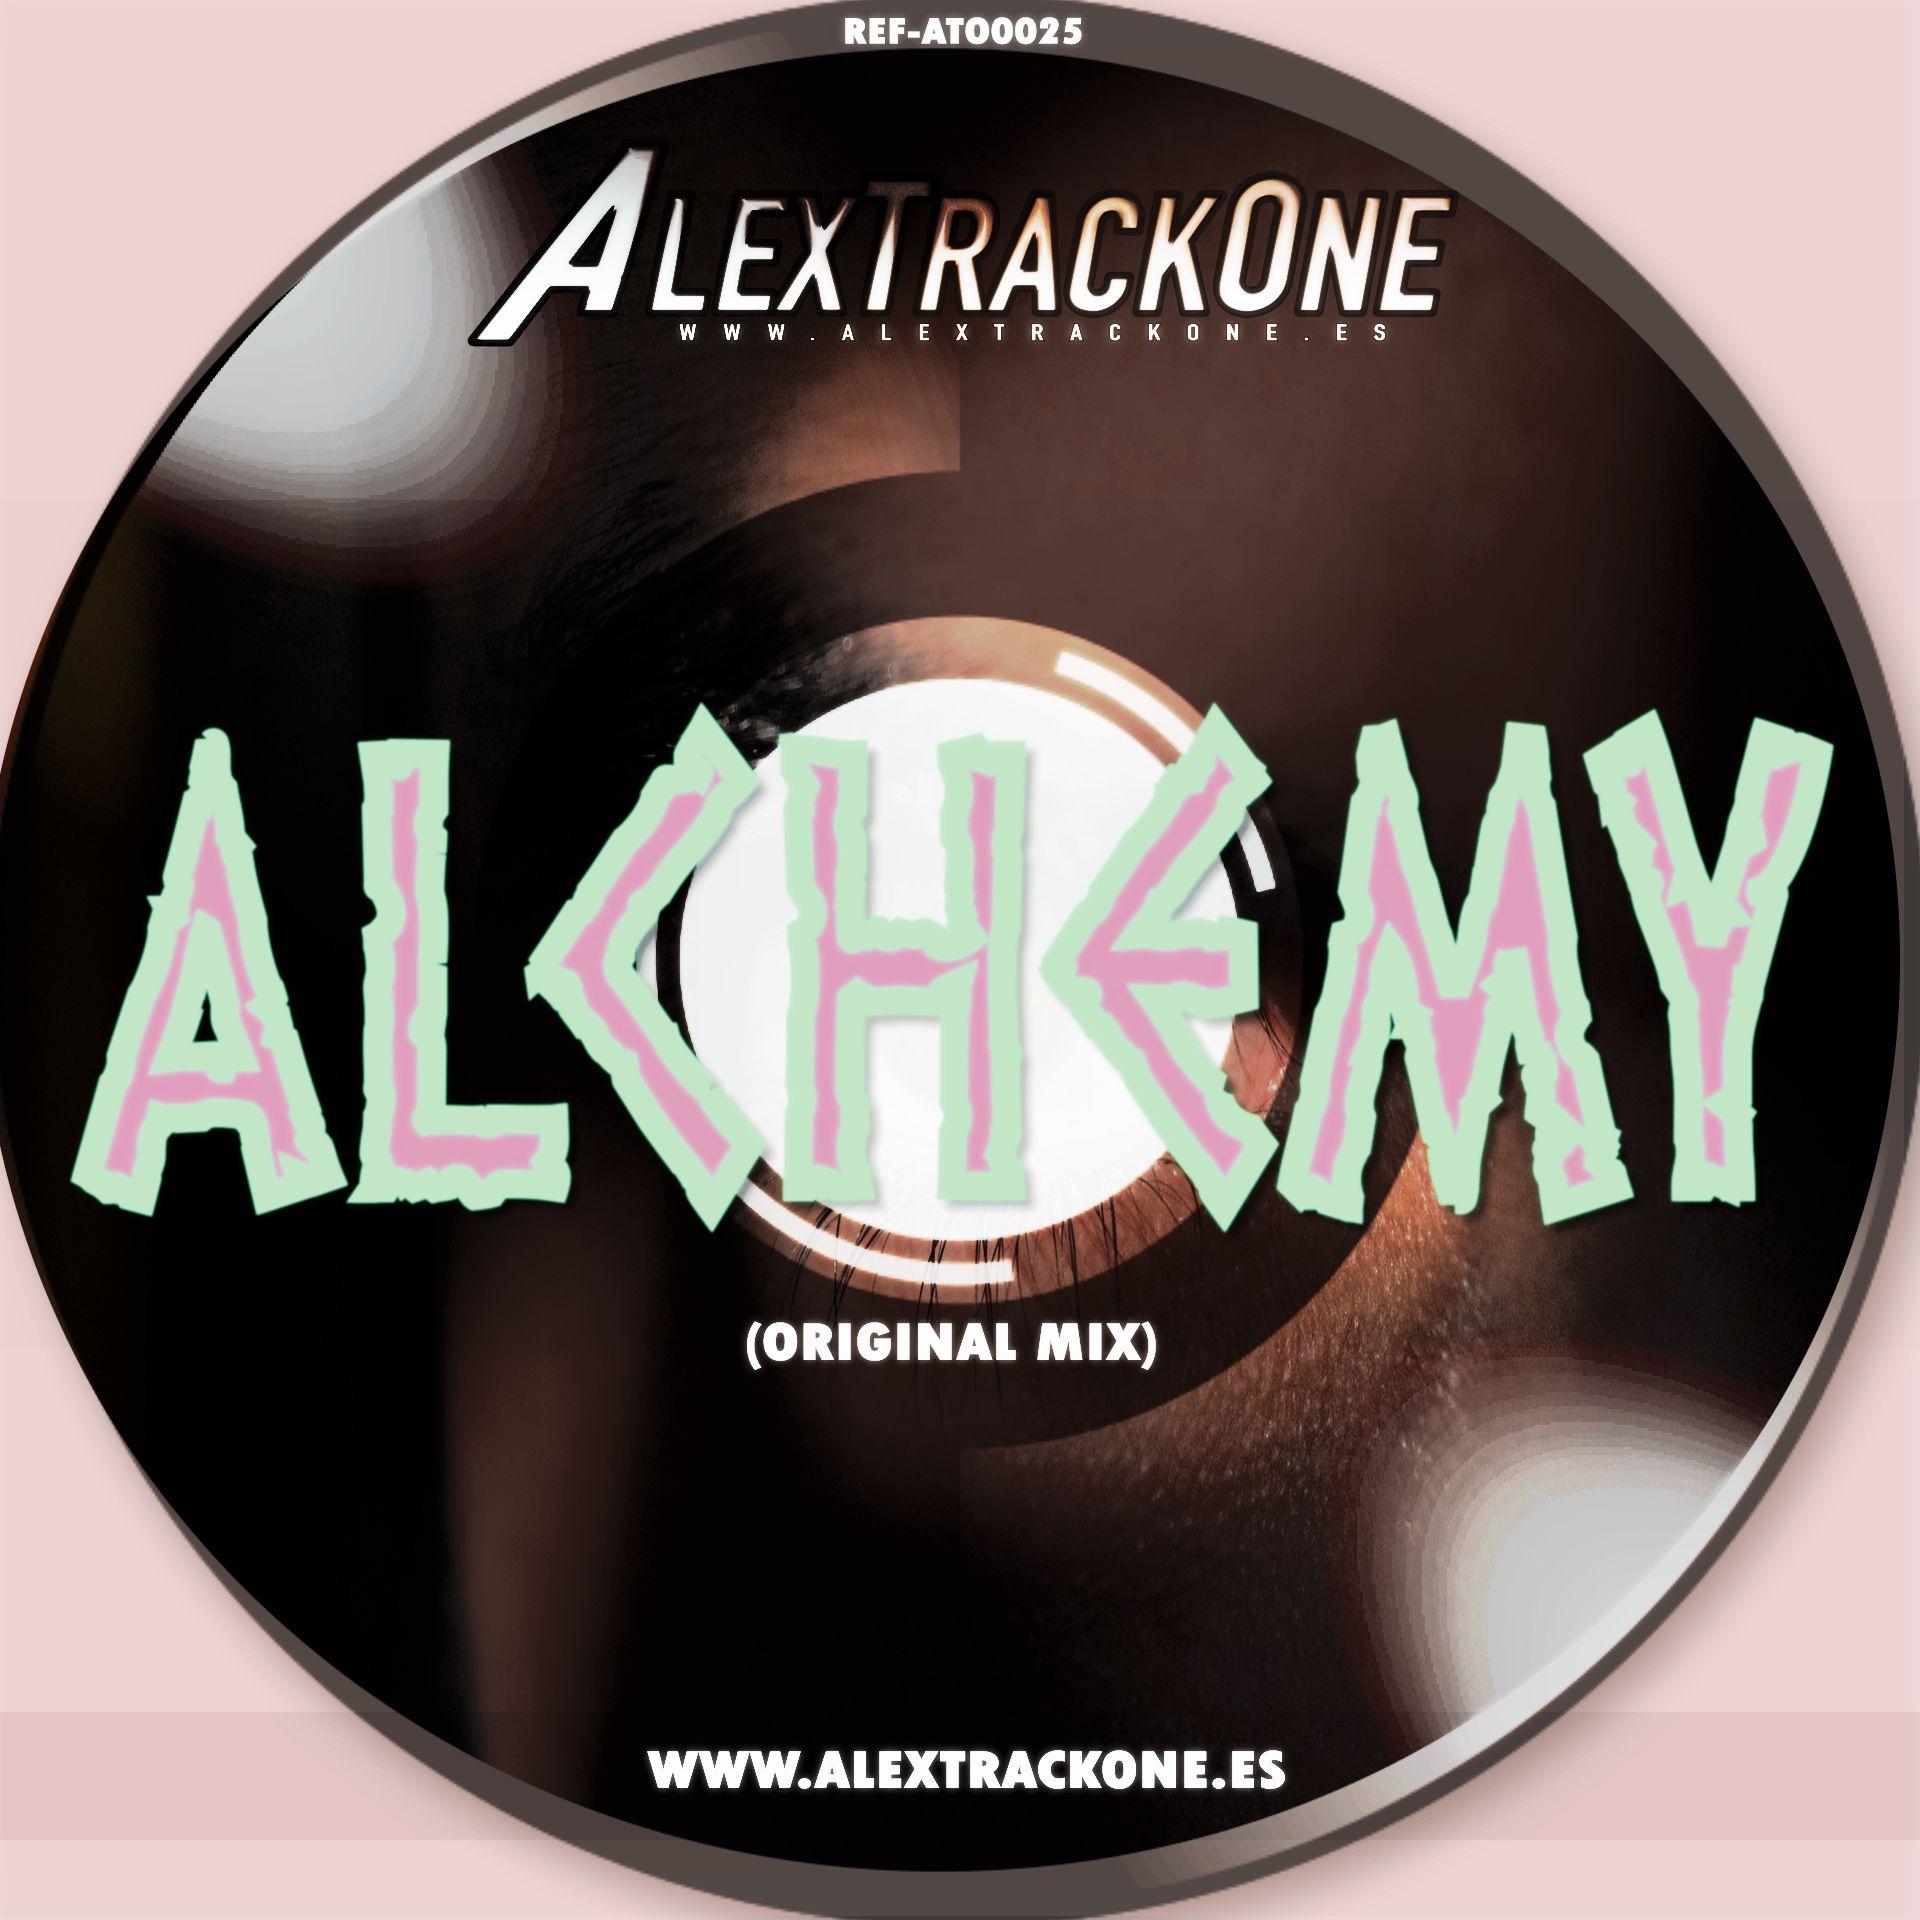 REF-ATO0025 ALCHEMY (ORIGINAL MIX) (MP3 & WAV)